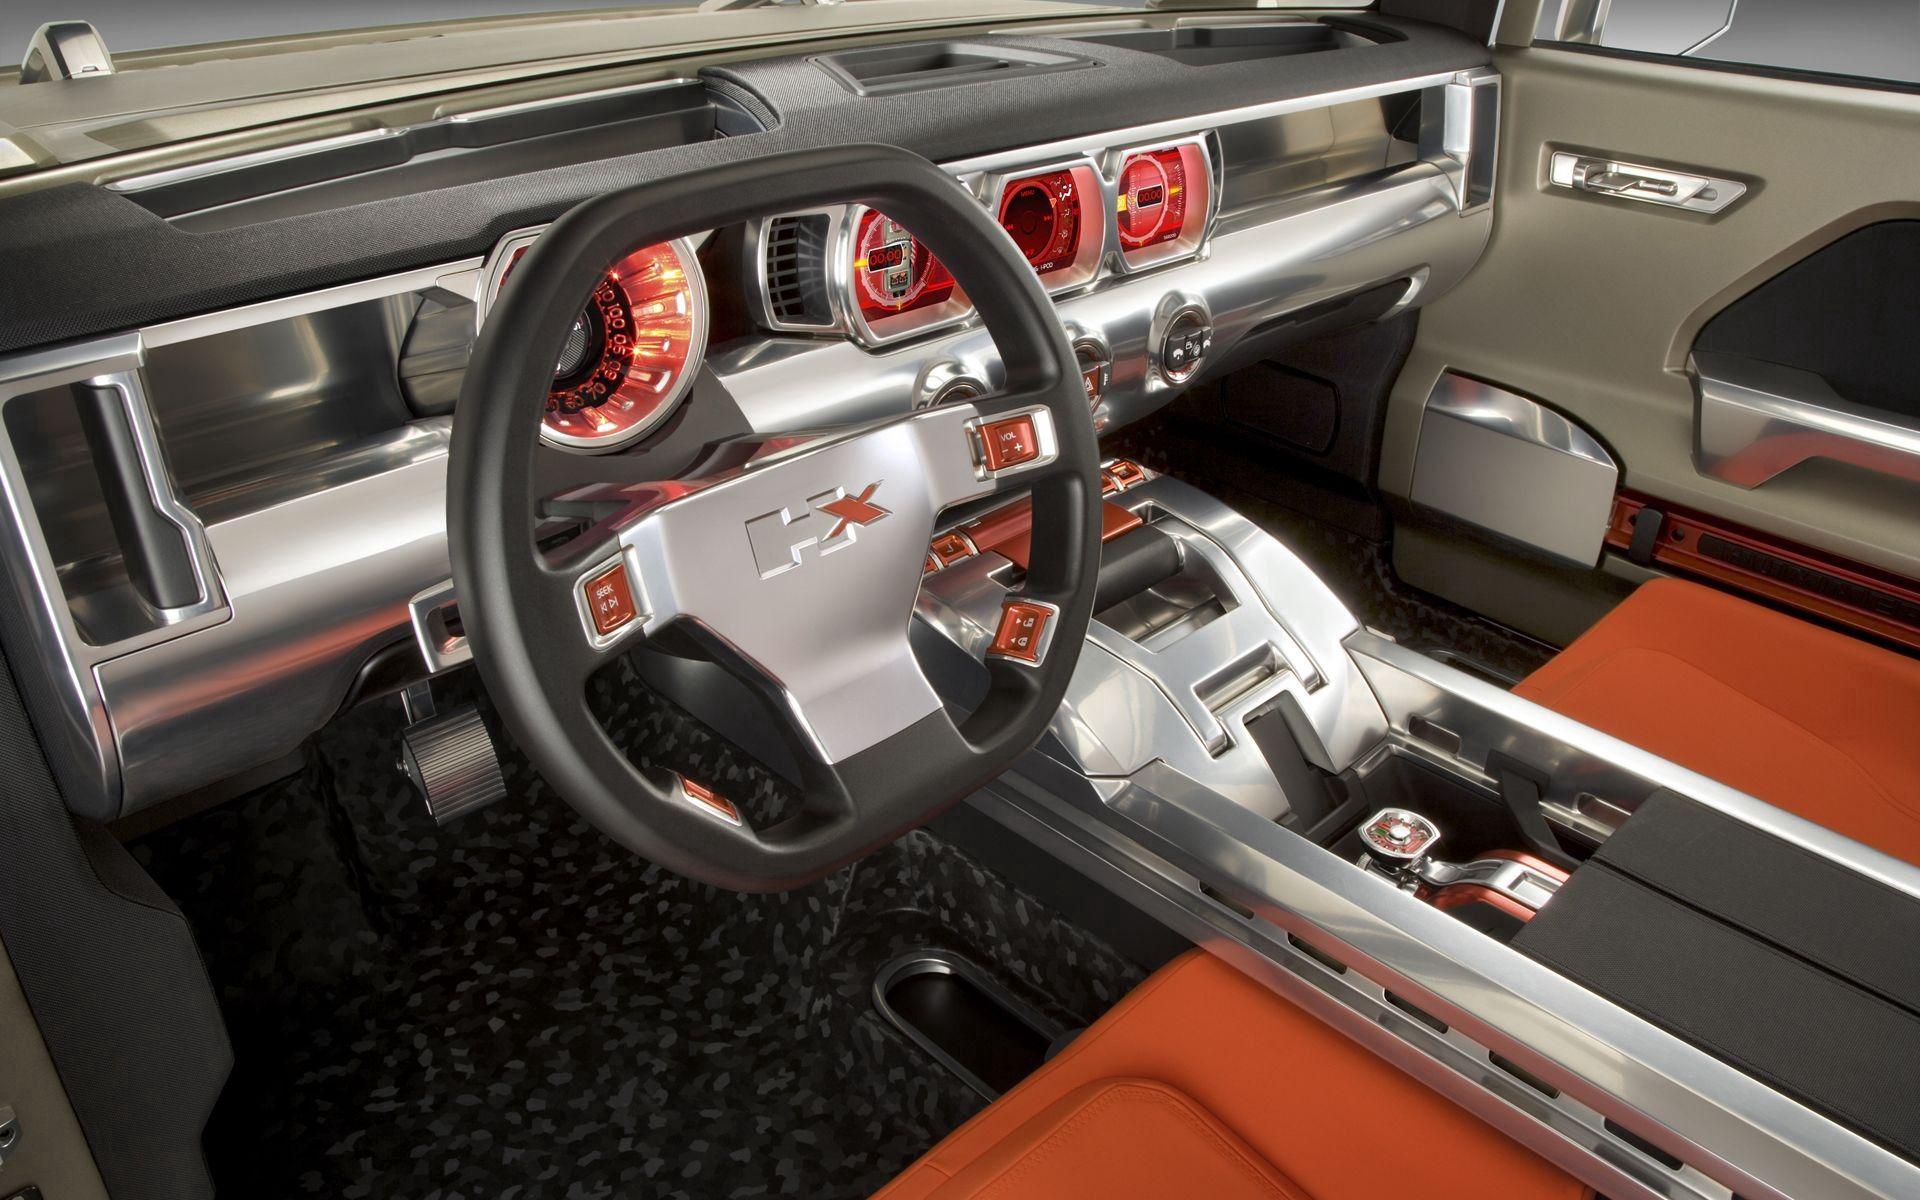 87805 скачать обои Тачки (Cars), Хаммер (Hummer), Hx, Concept, Хаммер, Салон - заставки и картинки бесплатно